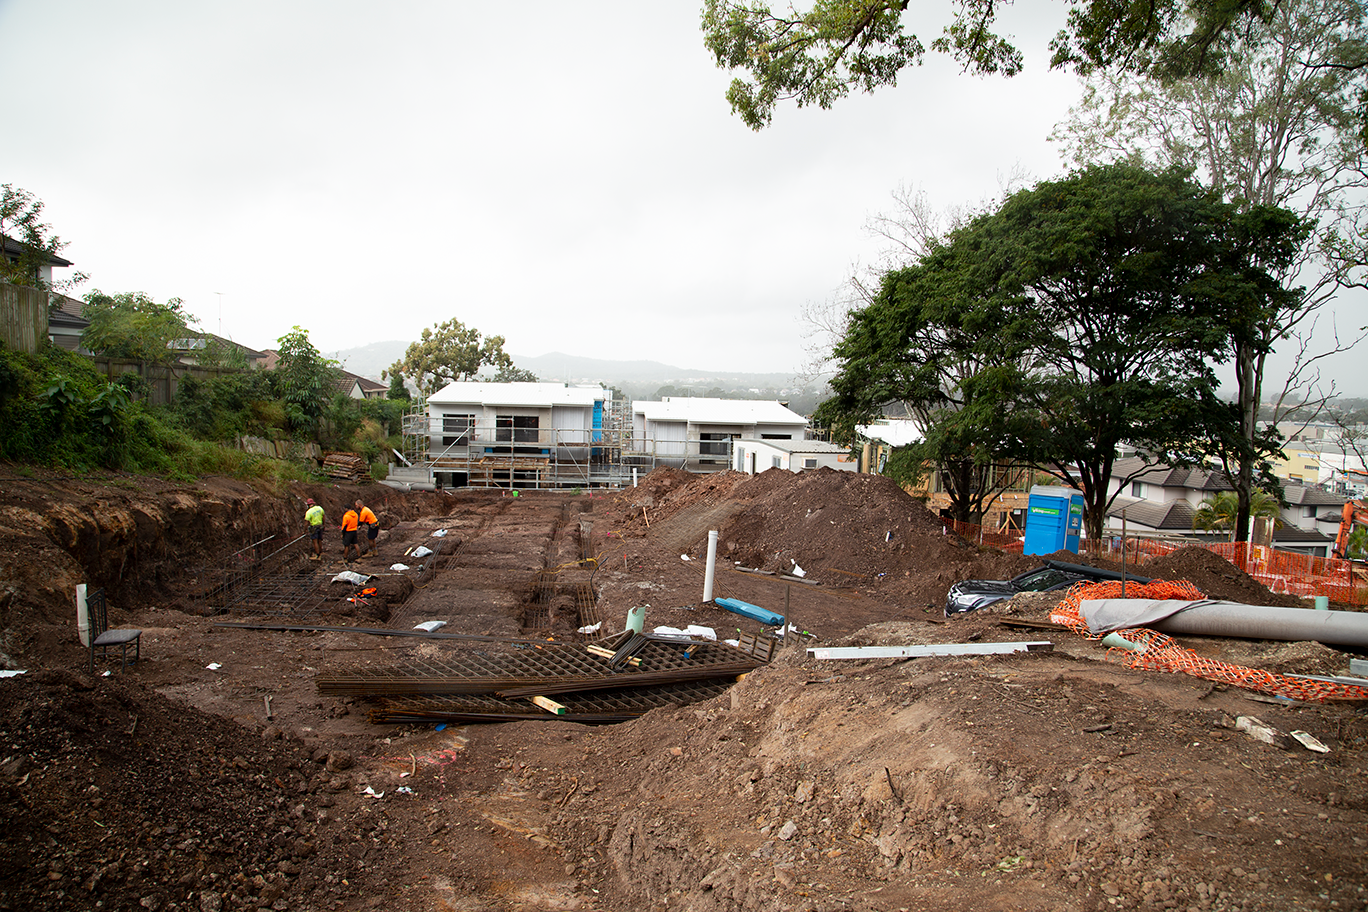 Site levelling at Mount Gravatt for Stage 2 townhouse development in Mount Gravatt Brisbane